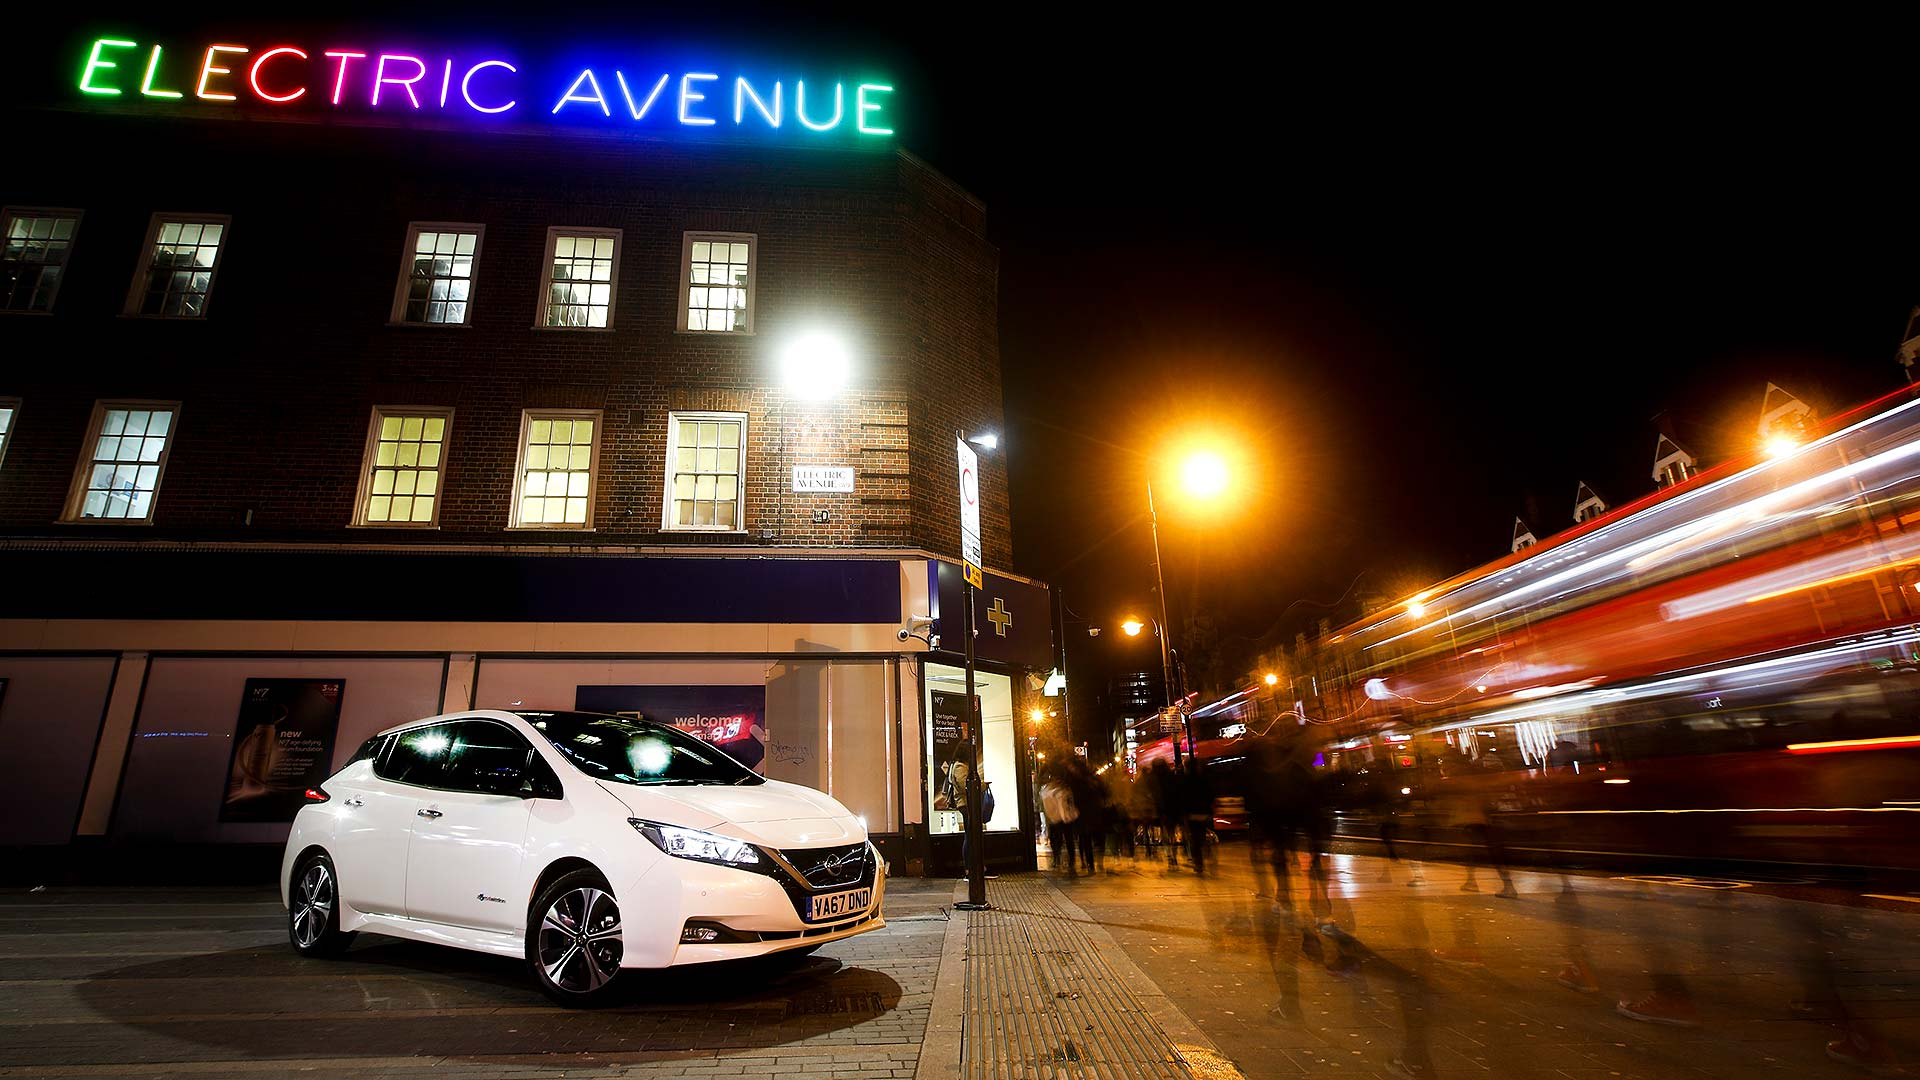 Nissan Leaf on Electric Avenue